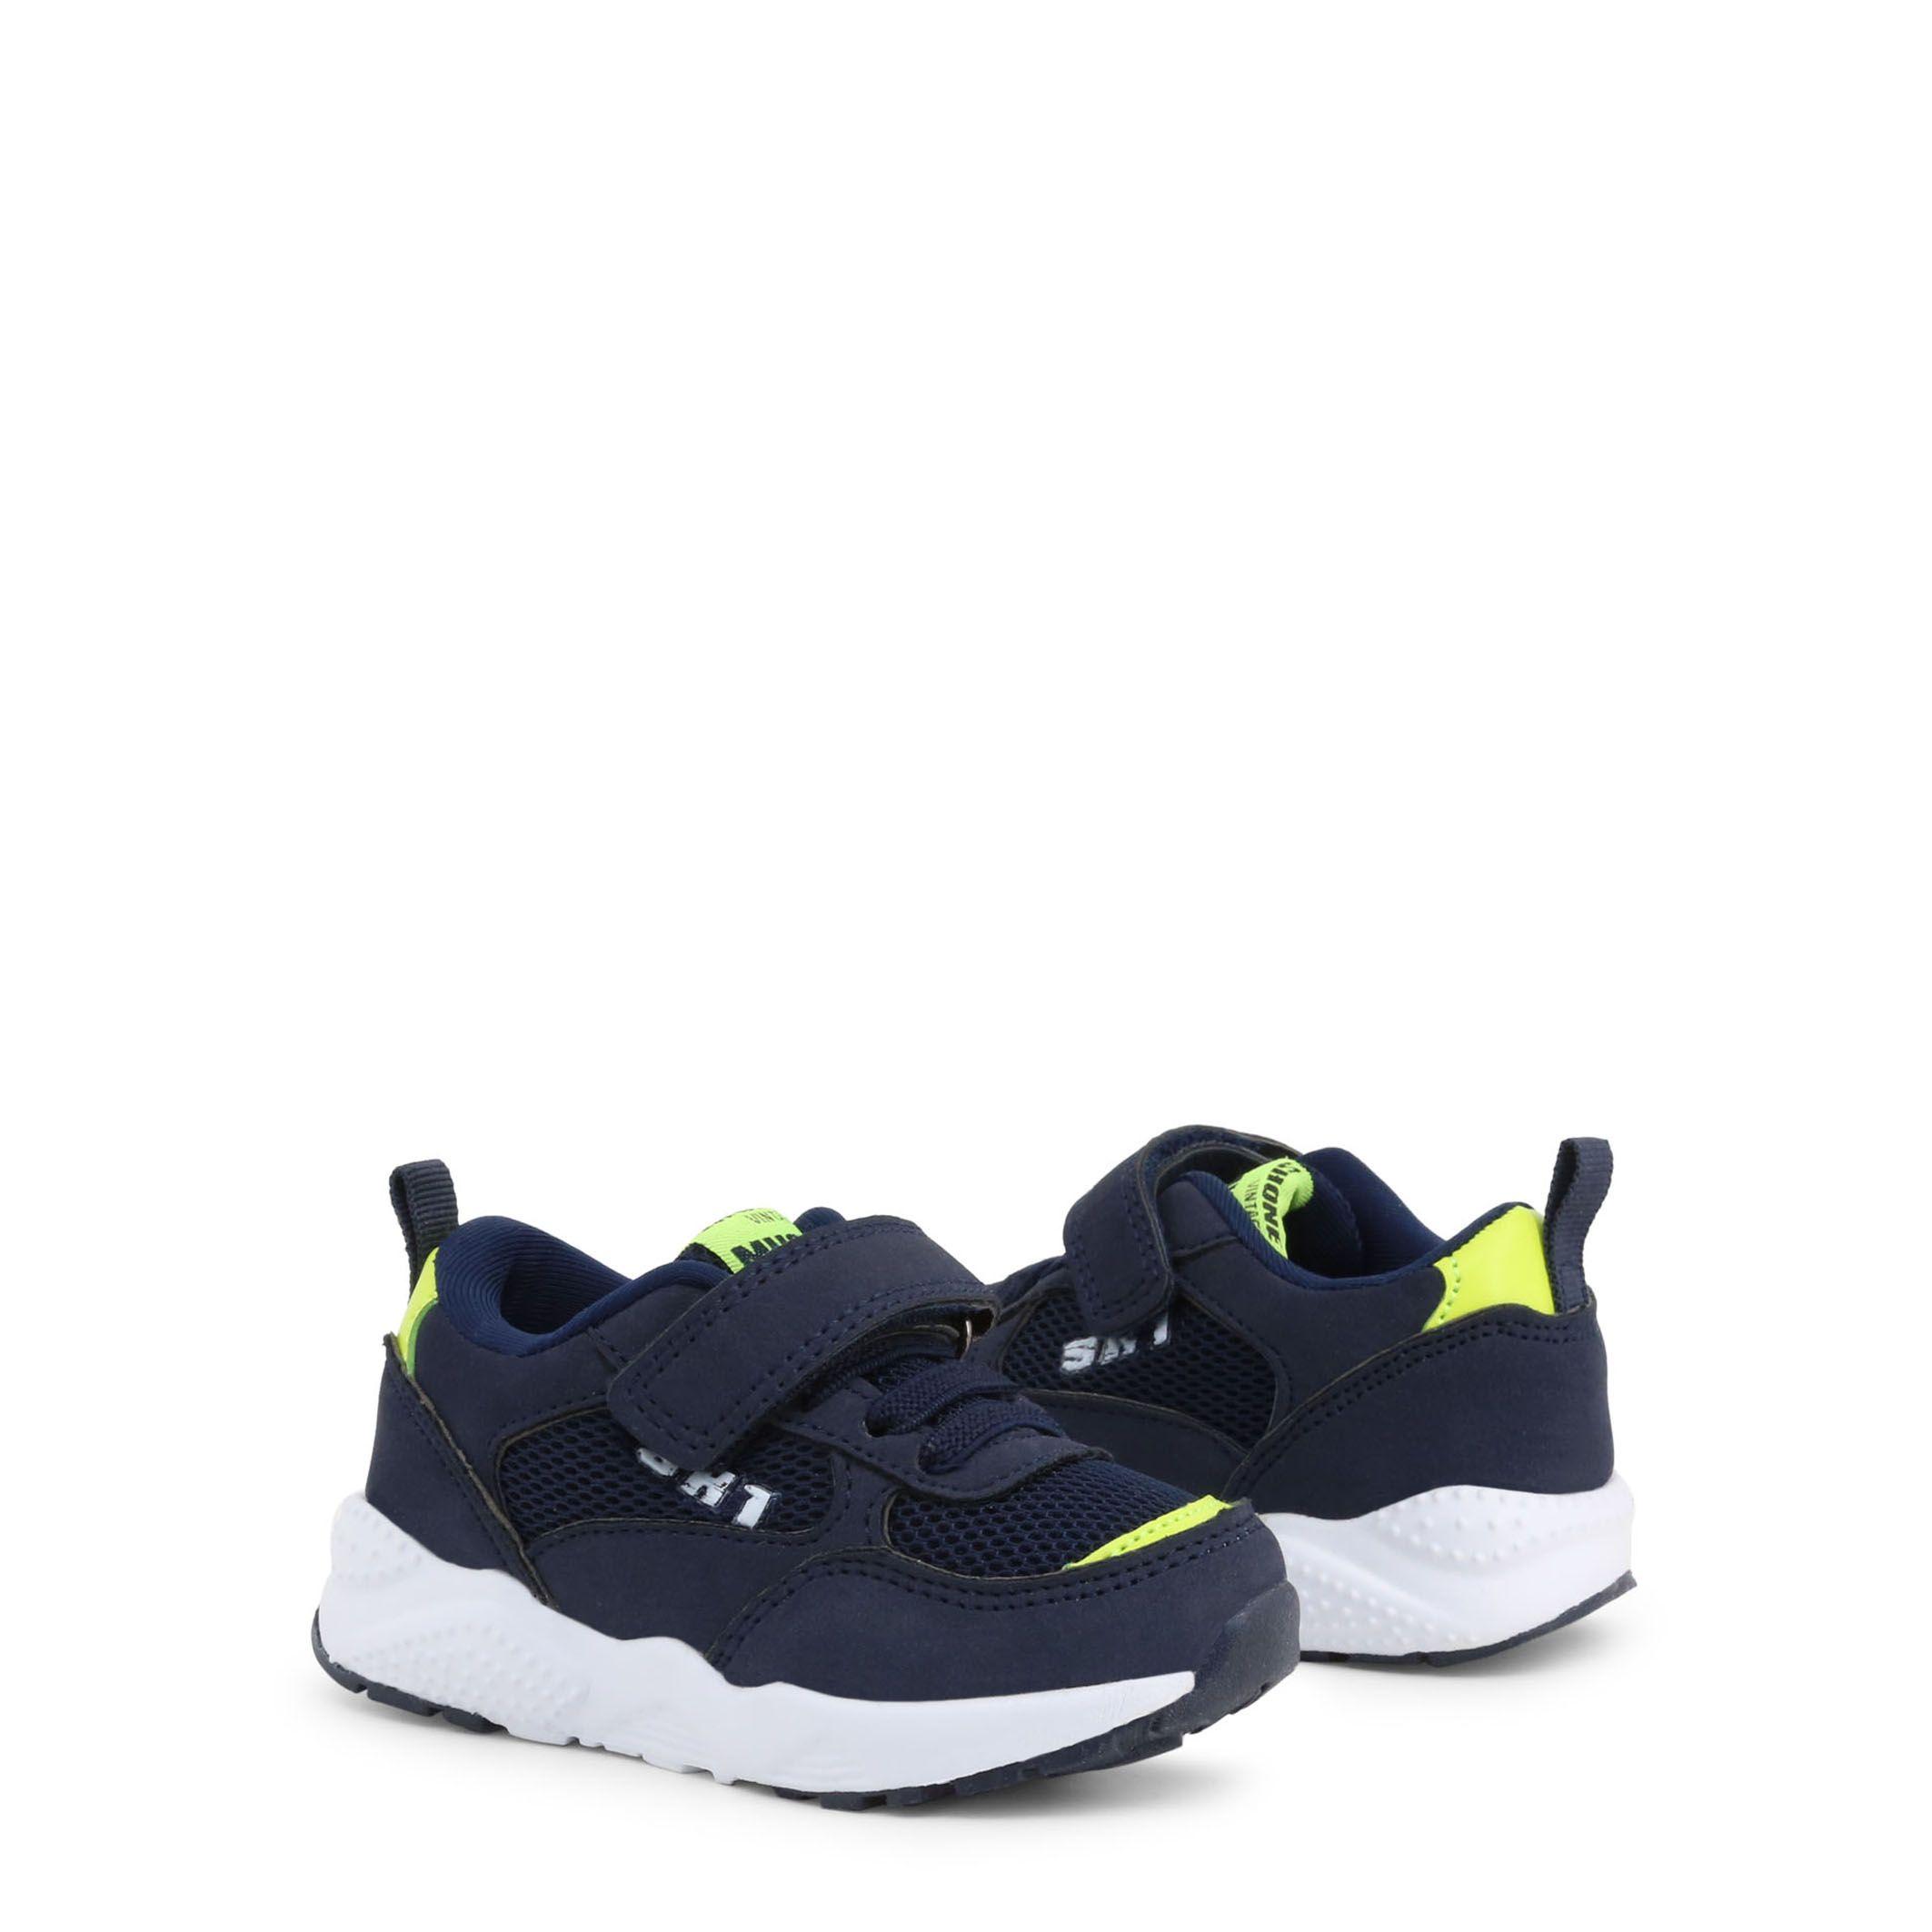 Sneakers Shone – 10260-001